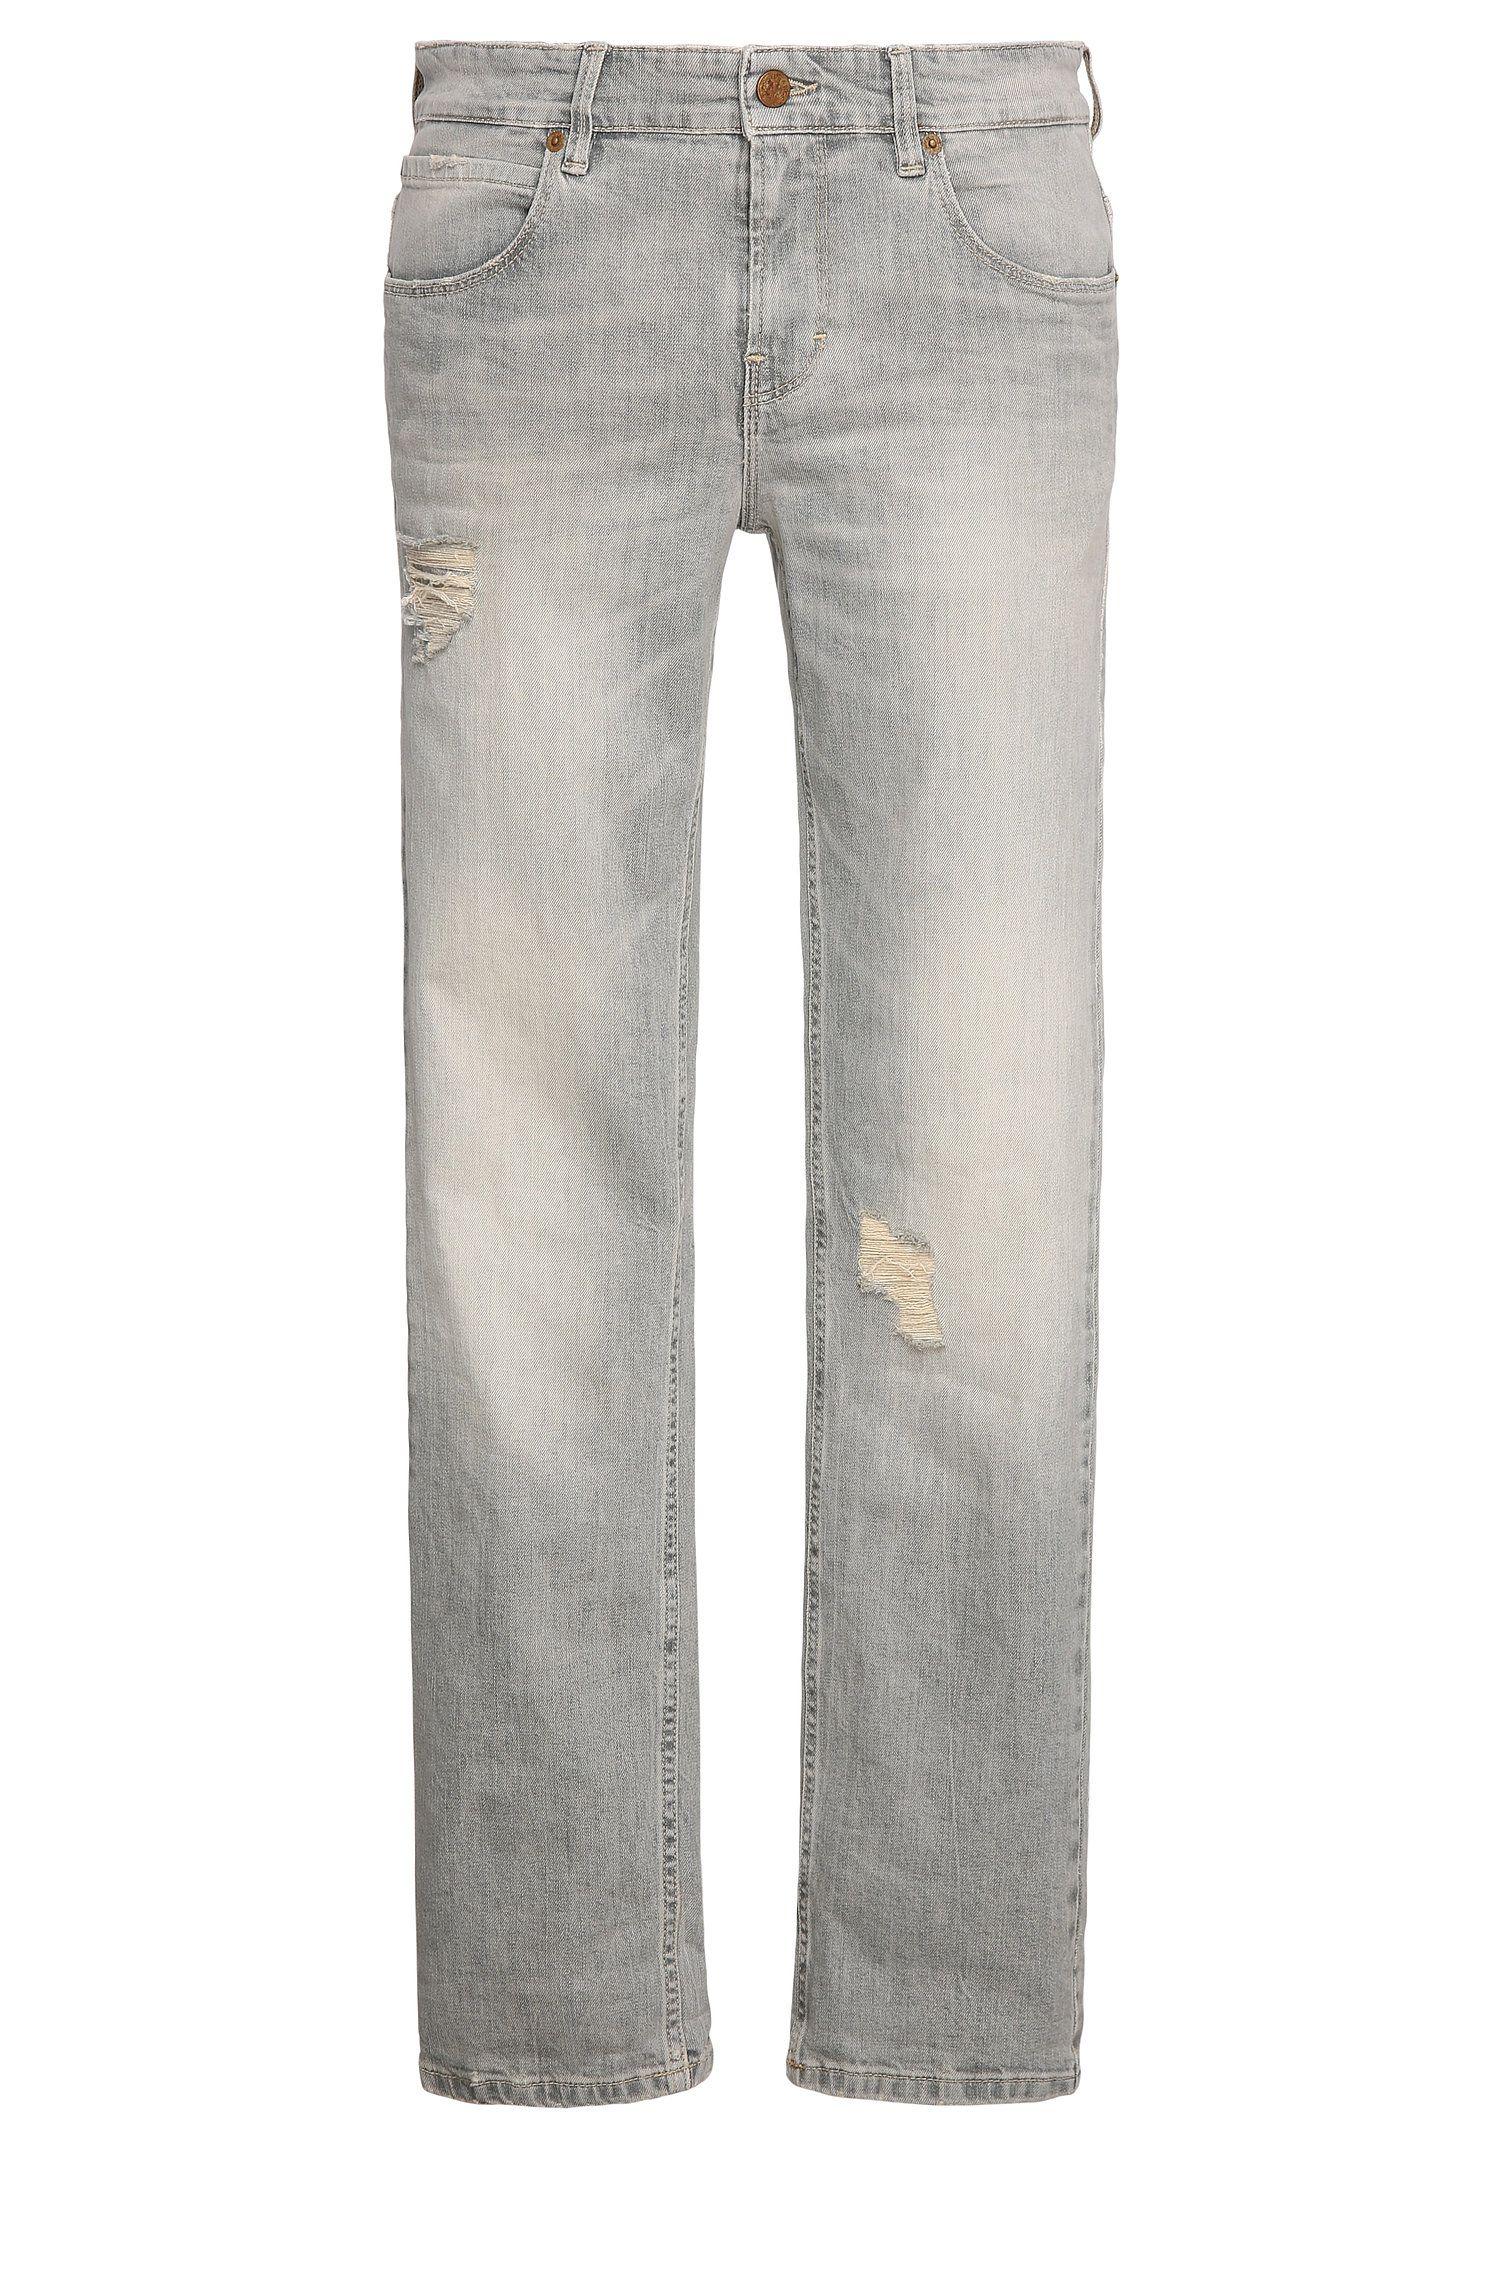 9.5 oz Distressed Stretch Cotton Jeans, Slim Fit | Orange63